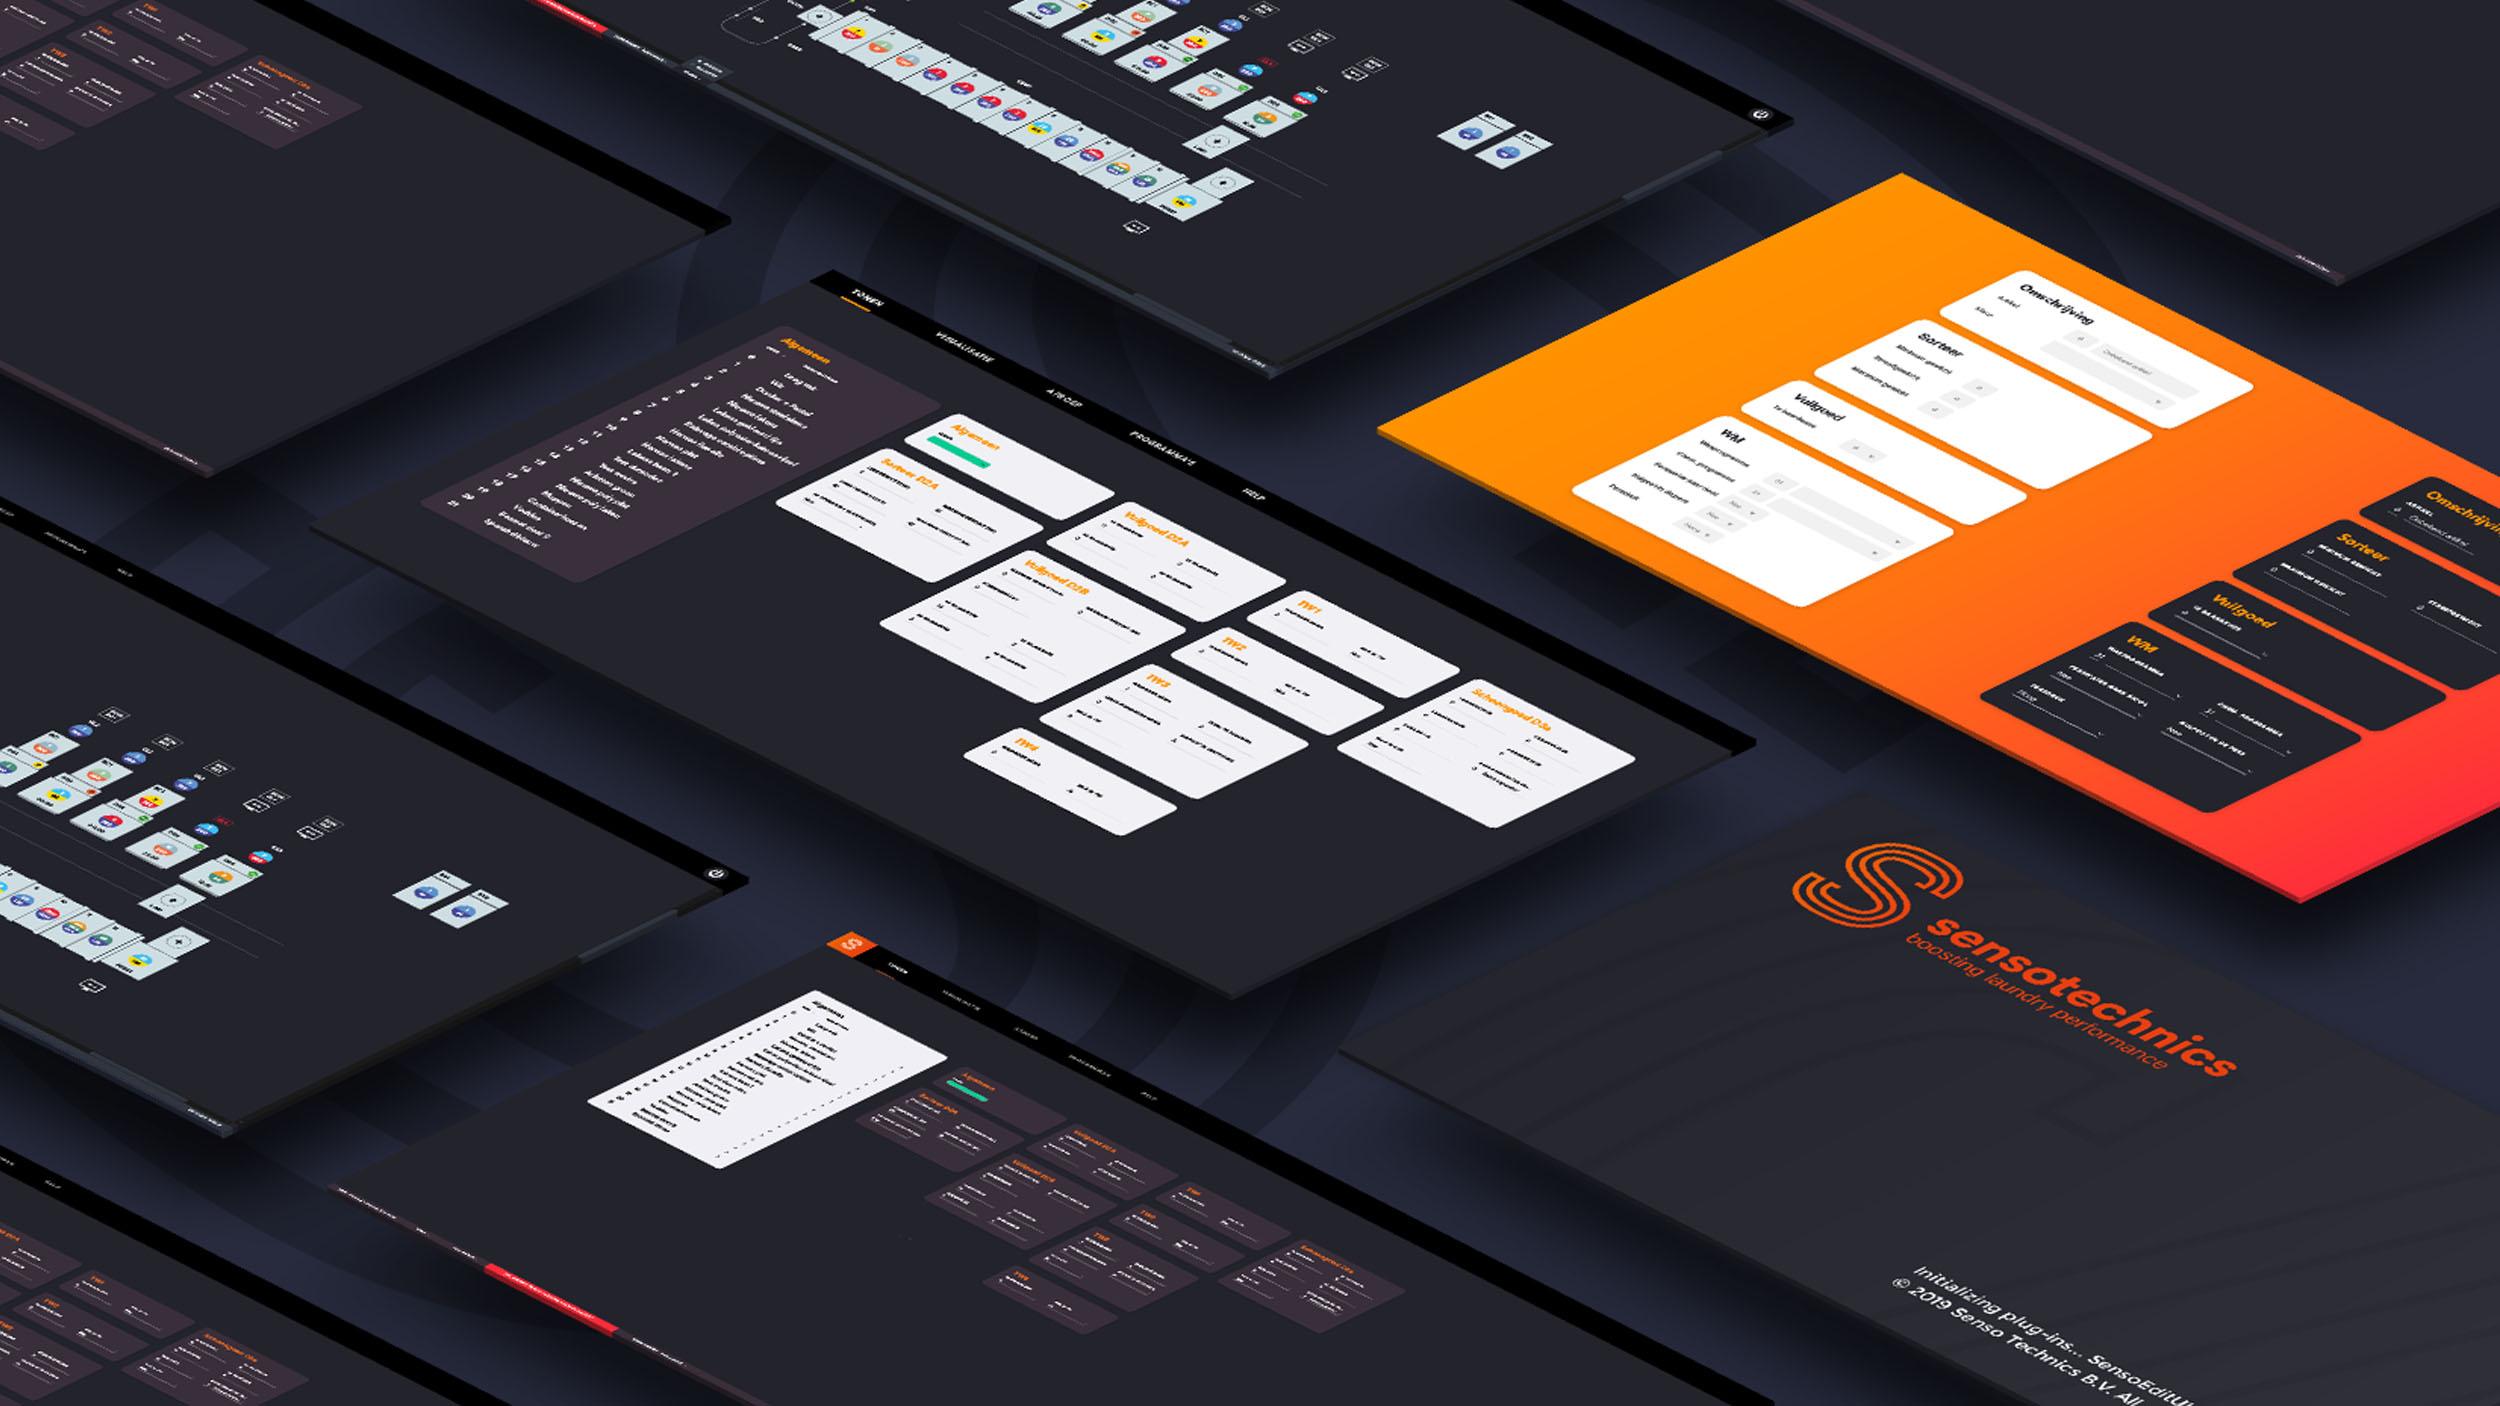 senso-interface-screens